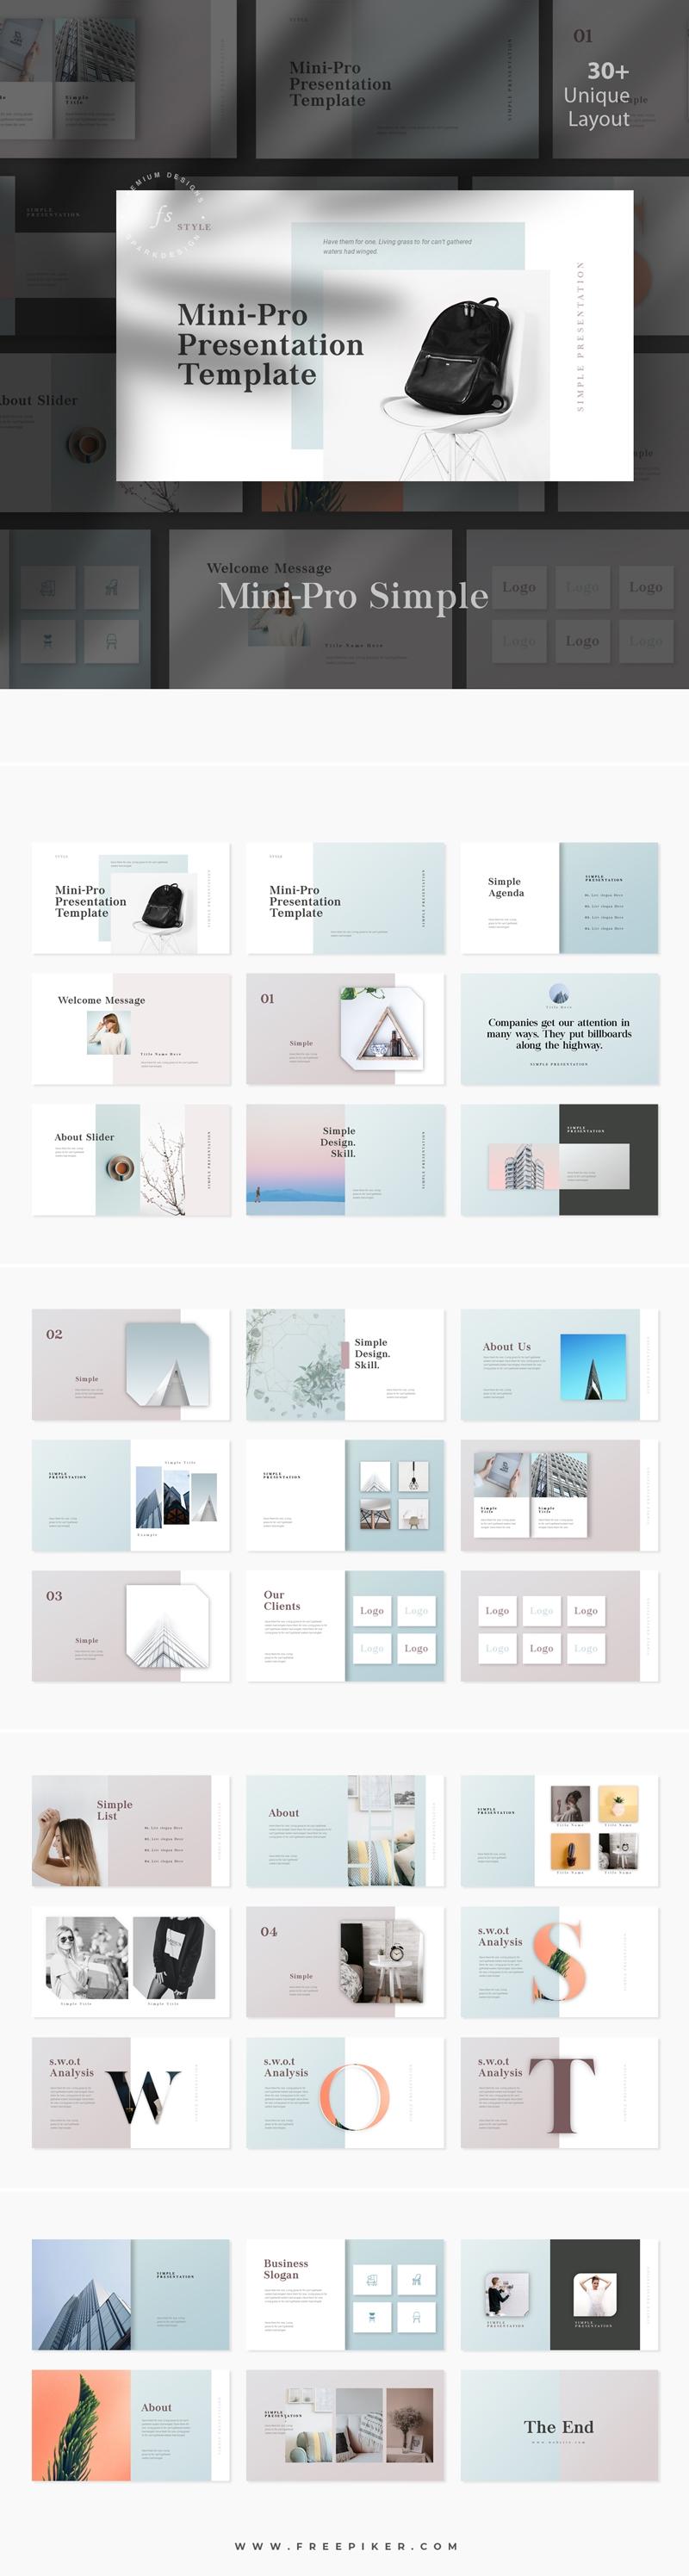 MiniPro Multipurpose PowerPoint Presentation